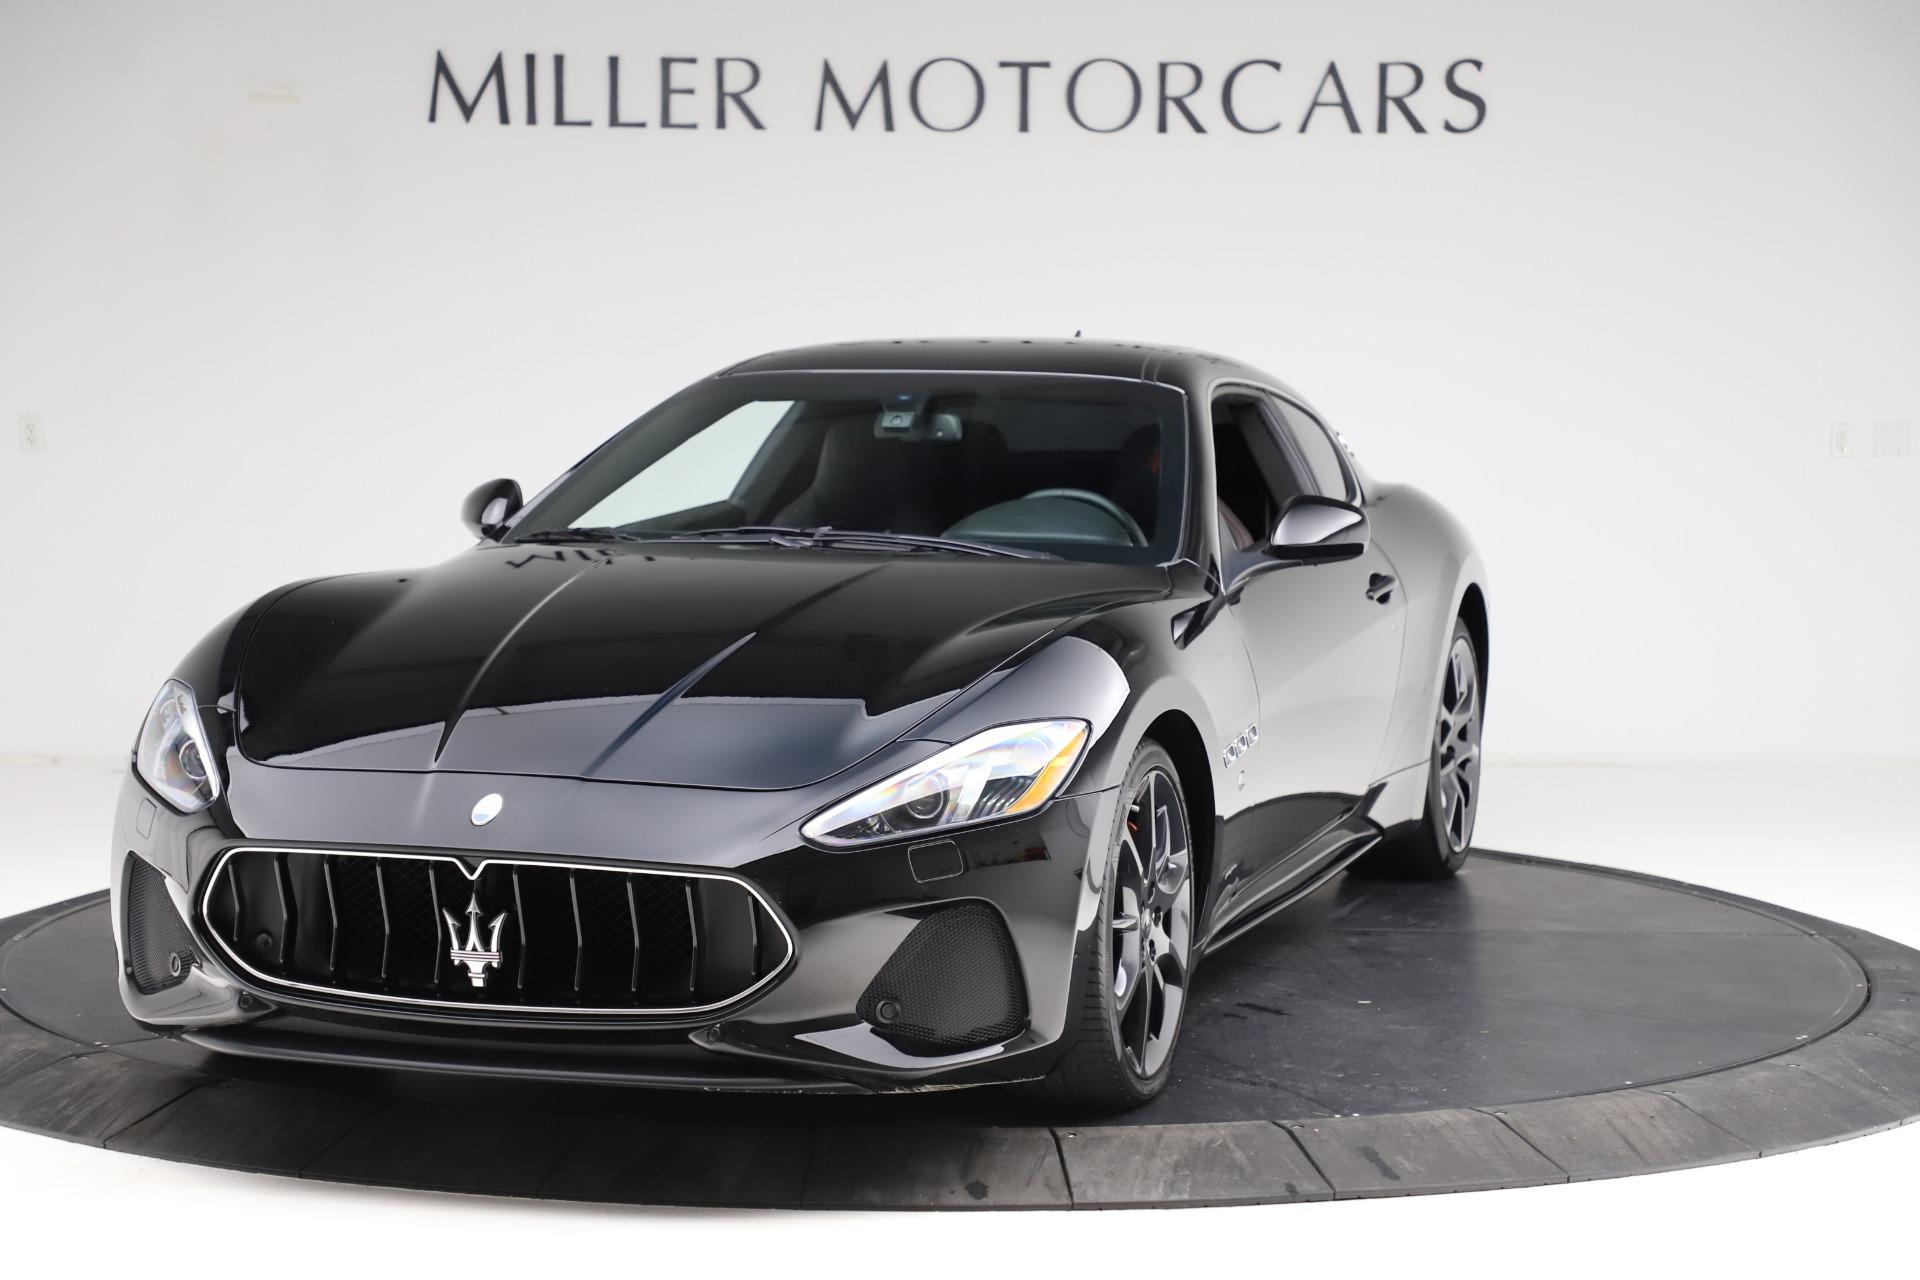 Used 2018 Maserati GranTurismo Sport for sale $99,900 at Bentley Greenwich in Greenwich CT 06830 1